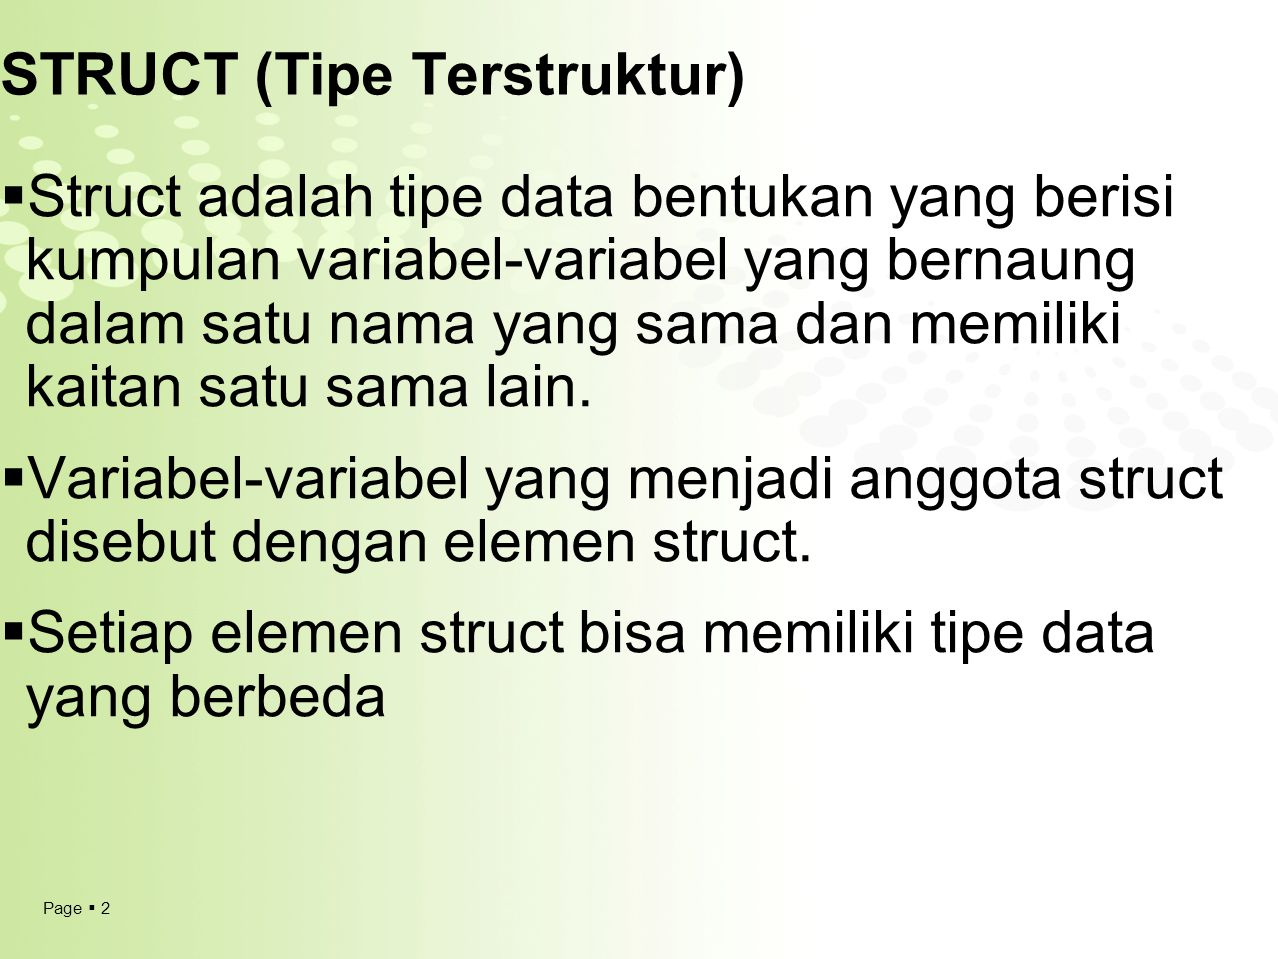 STRUCT (Tipe Terstruktur)